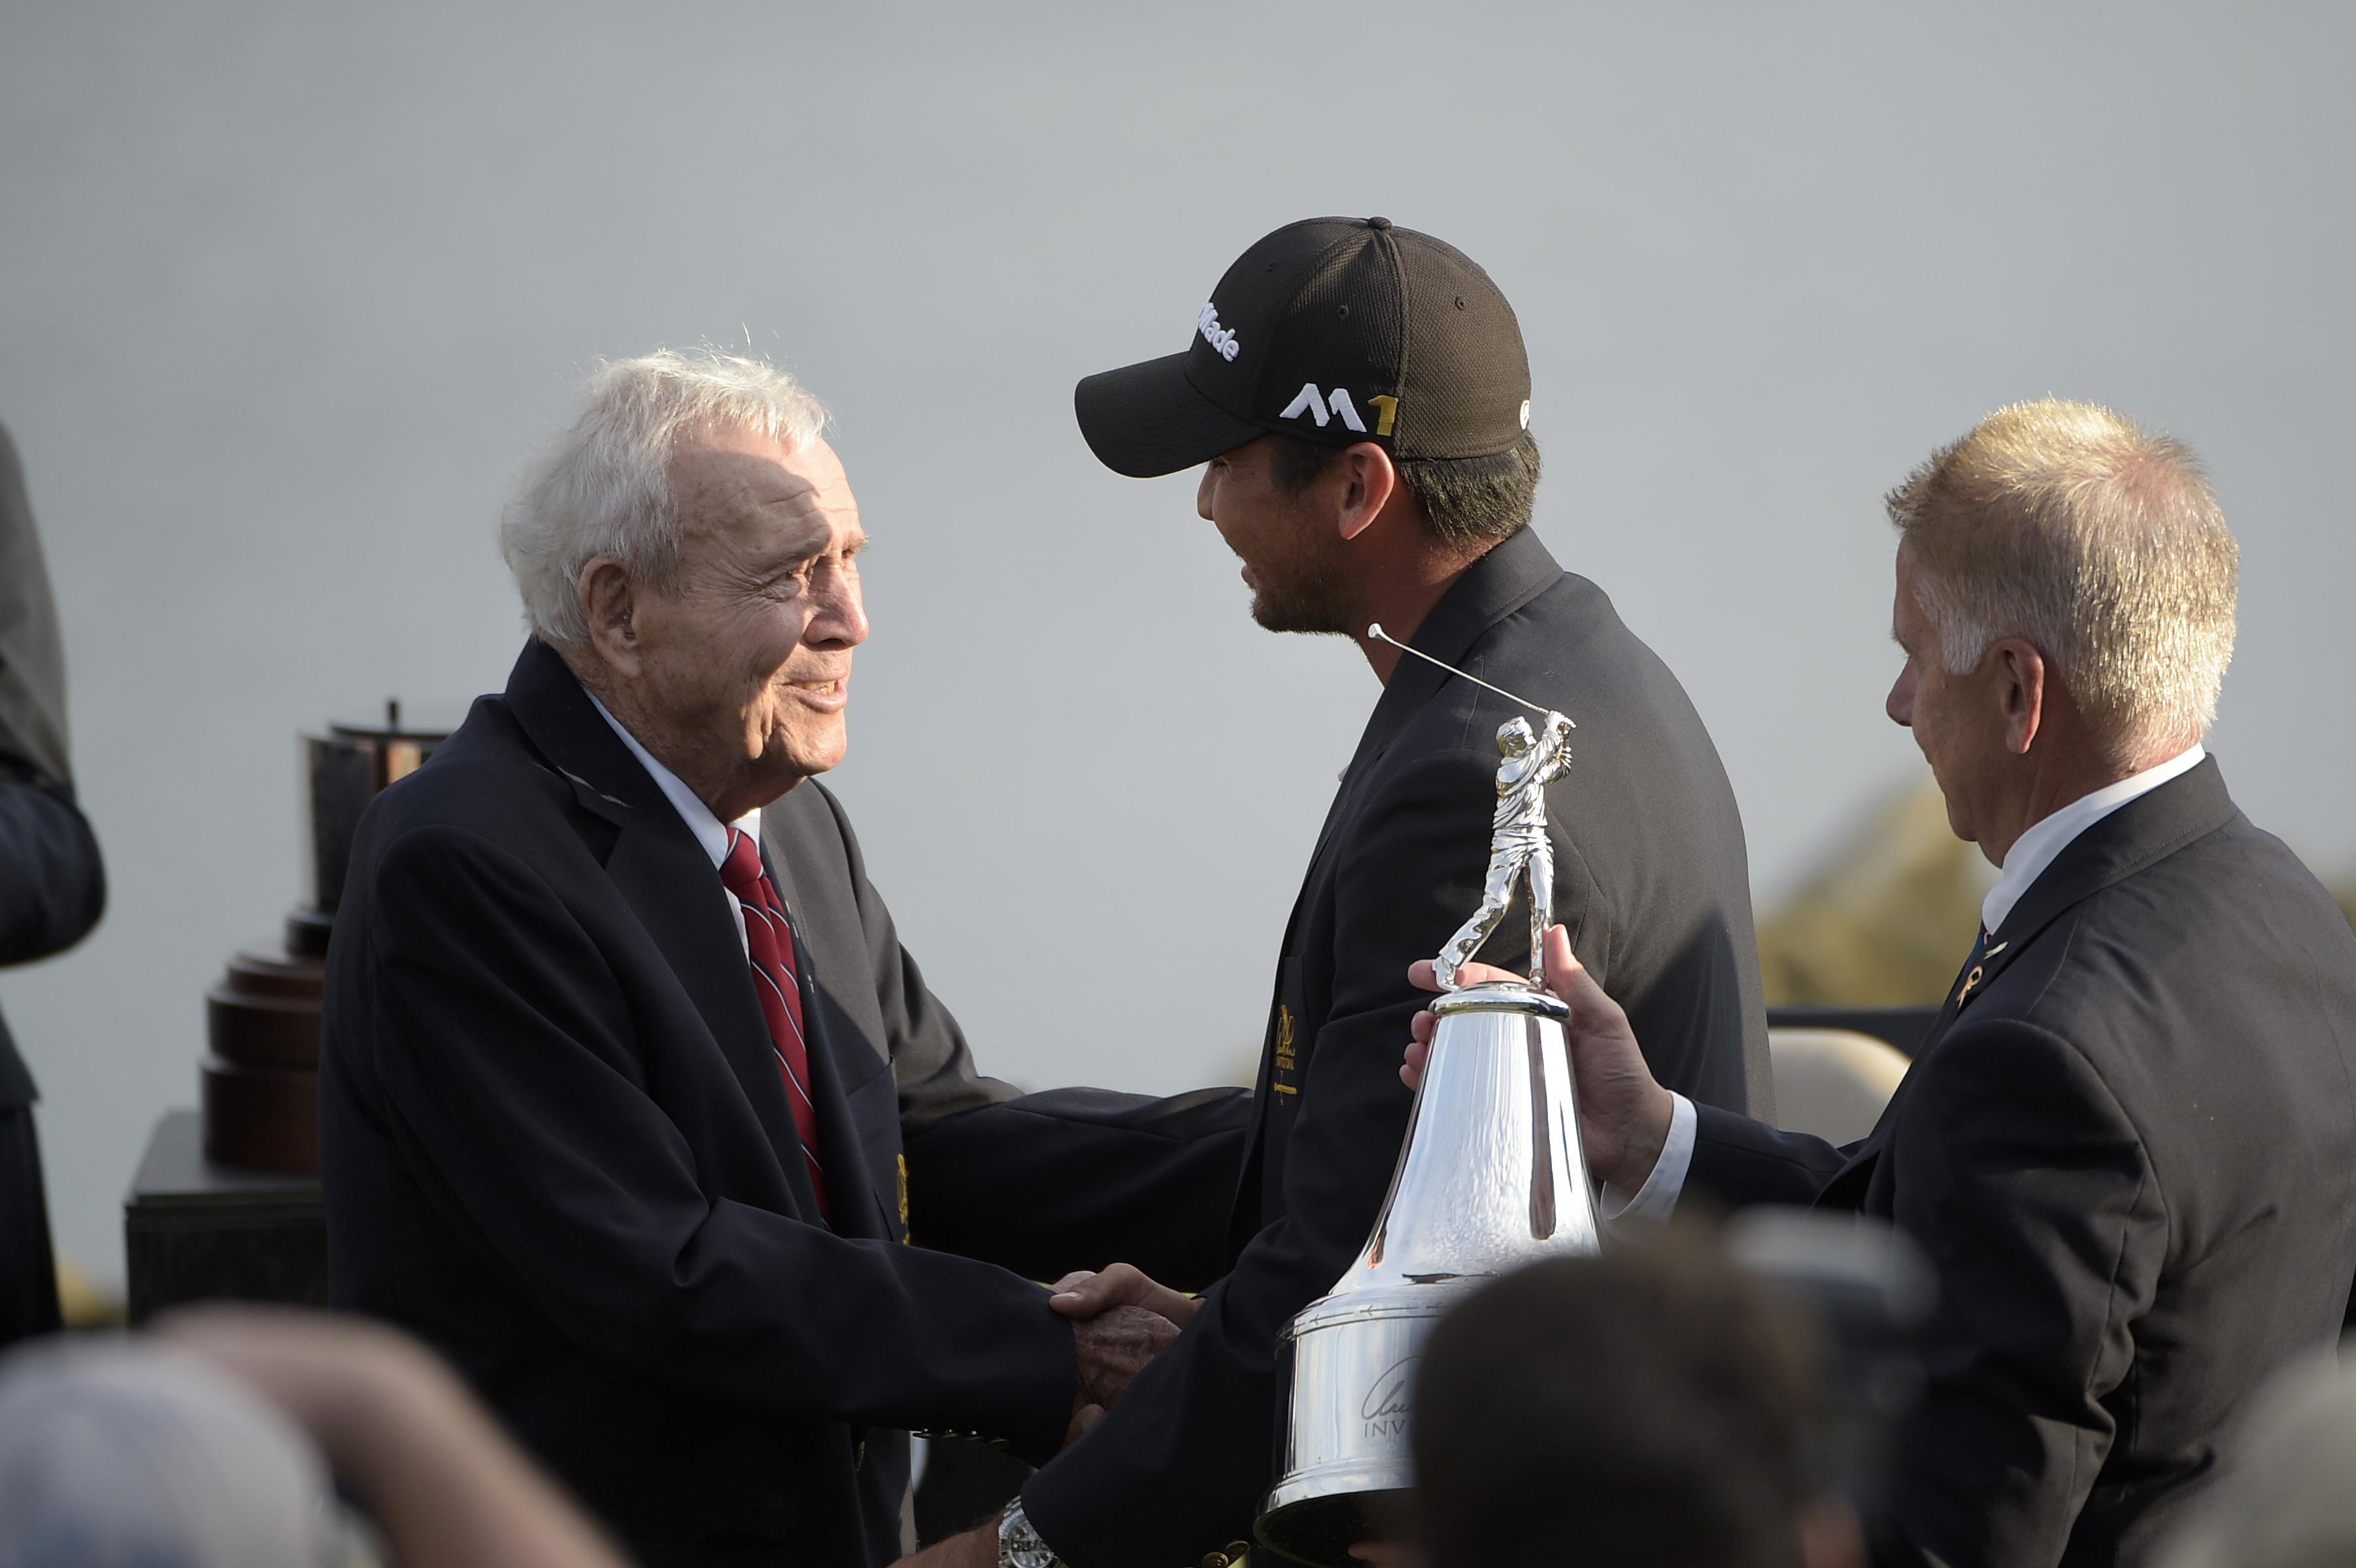 FILE - In this March 20, 2016, file photo, Arnold Palmer, left, congratulates Jason Day, center, of Australia, after Day won the Arnold Palmer Invitational golf tournament in Orlando, Fla. (AP Photo/Phelan M. Ebenhack, File)